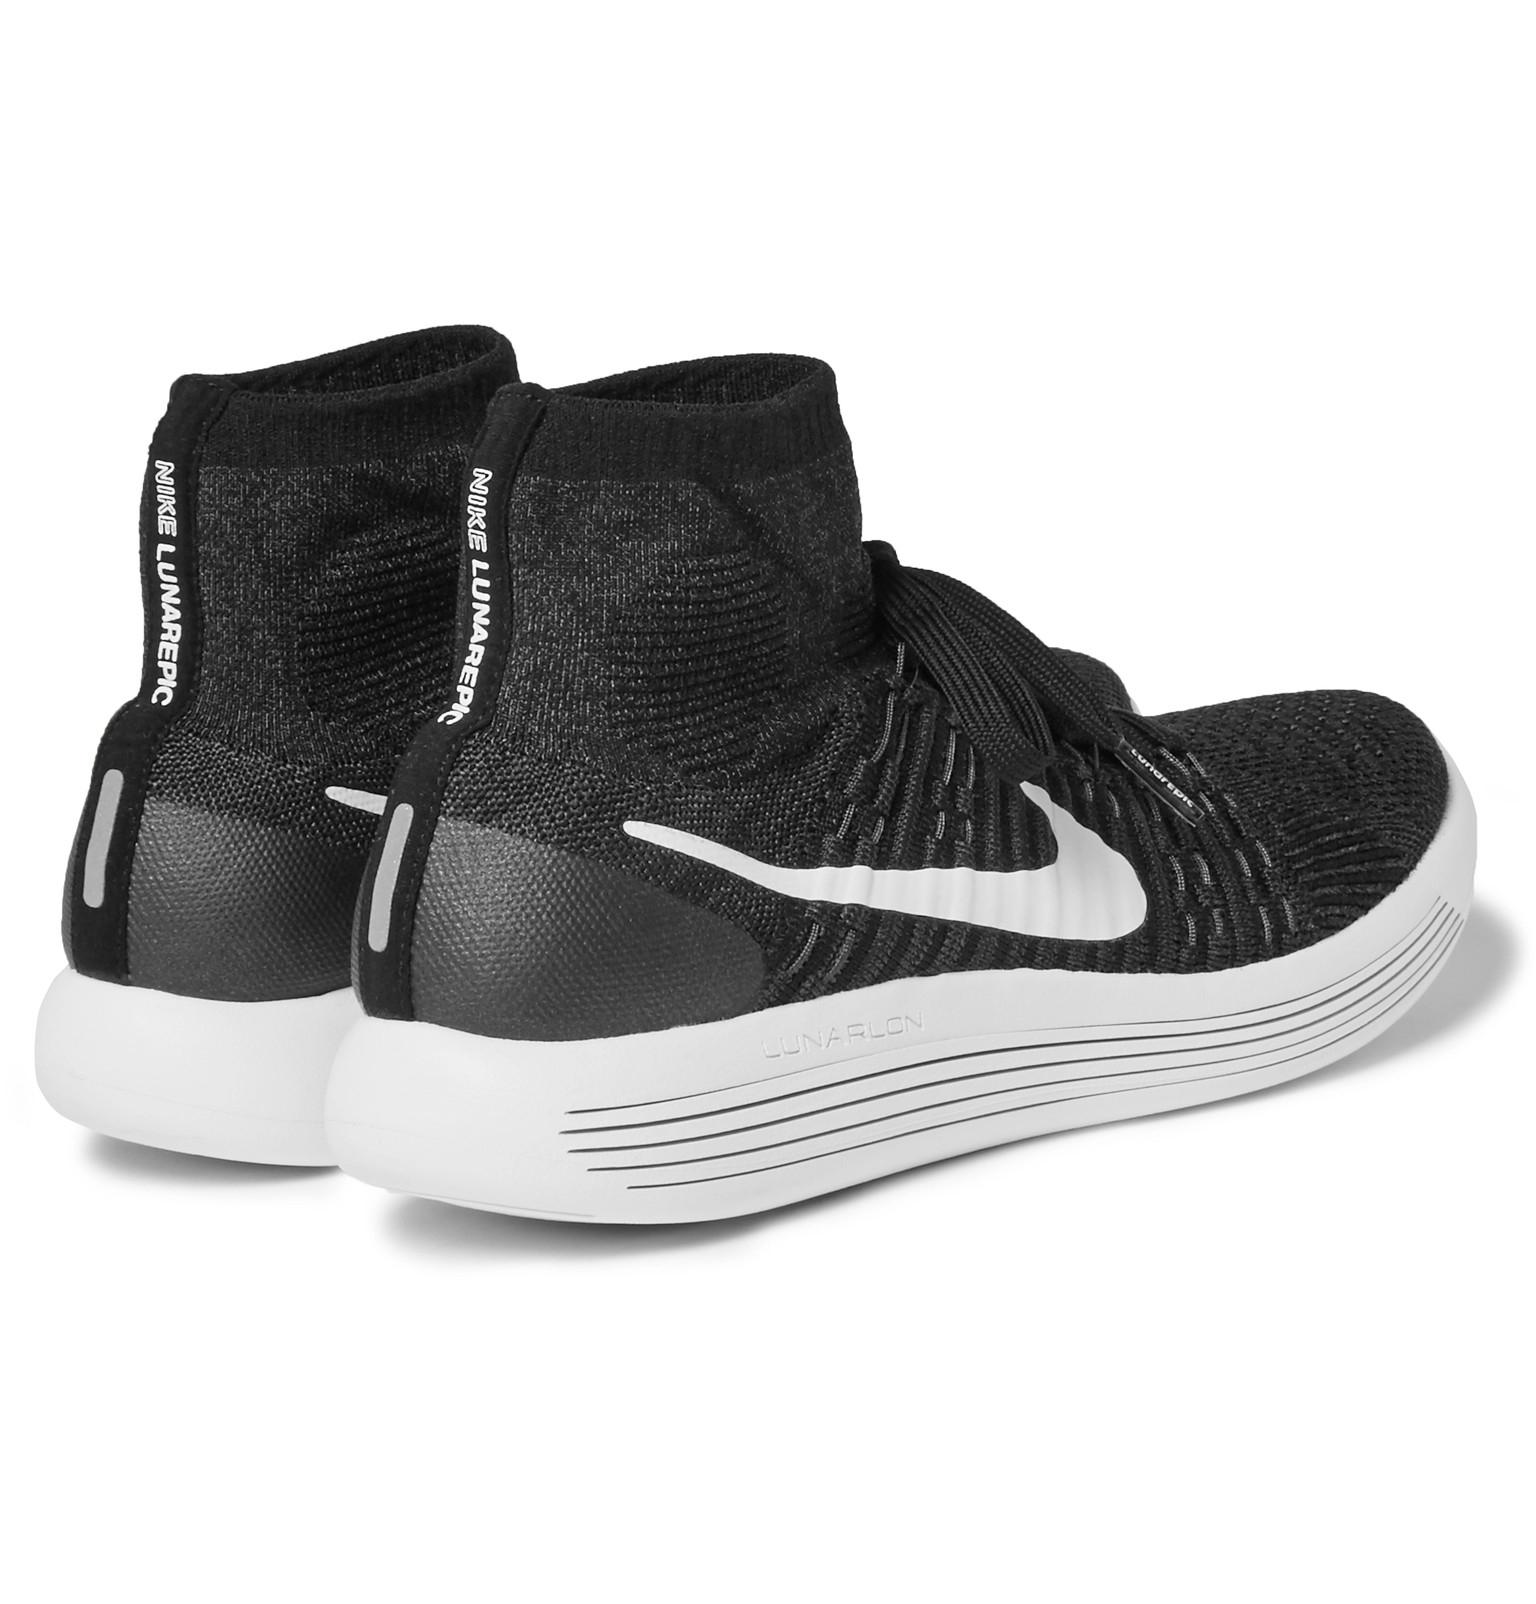 Nike Lunarepic Flyknit High-top Sneakers in Black for Men ...